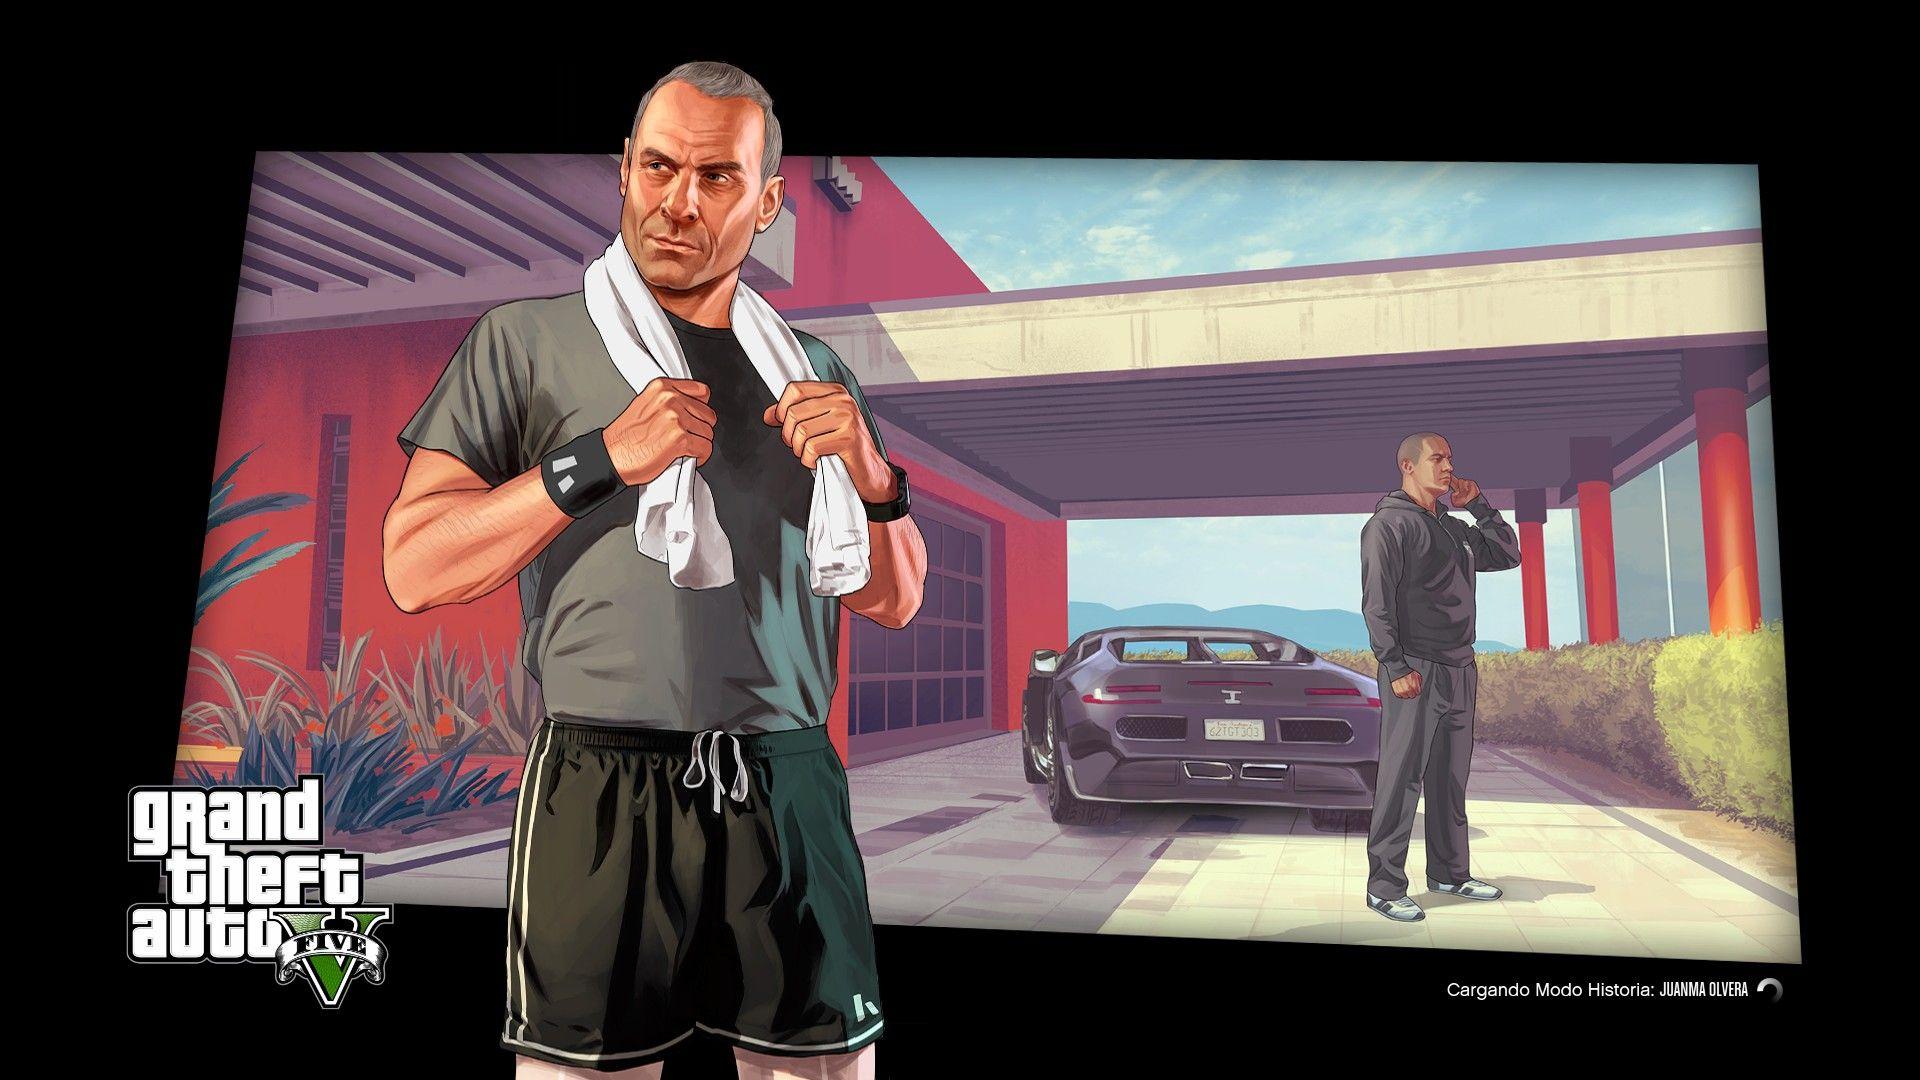 Devin Weston | GTA | Grand theft auto, Gta, Rockstar games